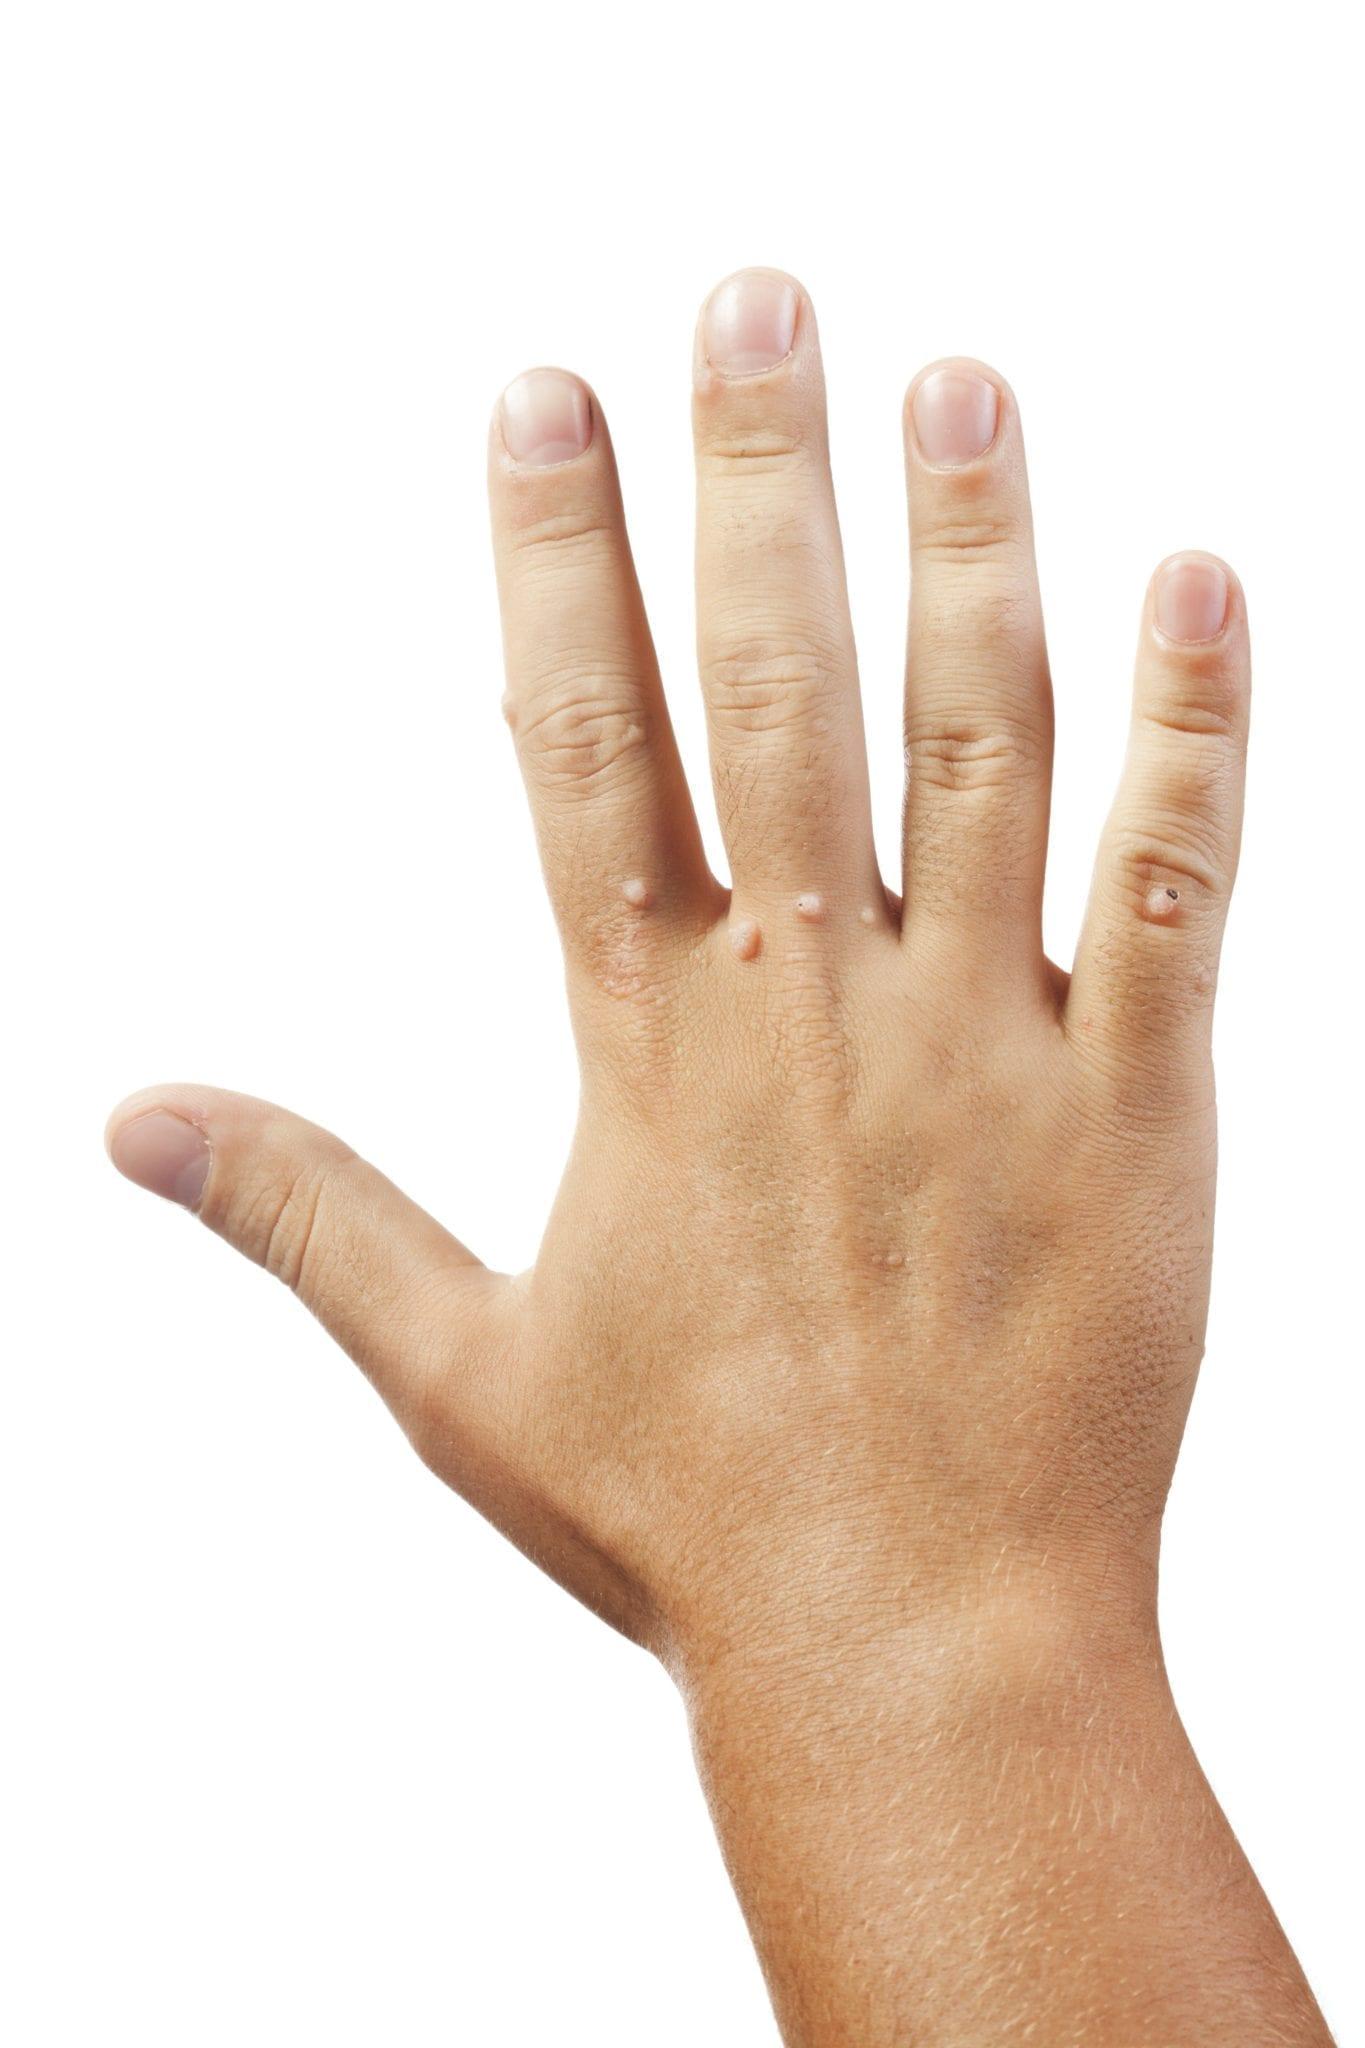 Virus del papiloma en manos, Virus del papiloma humano cancer